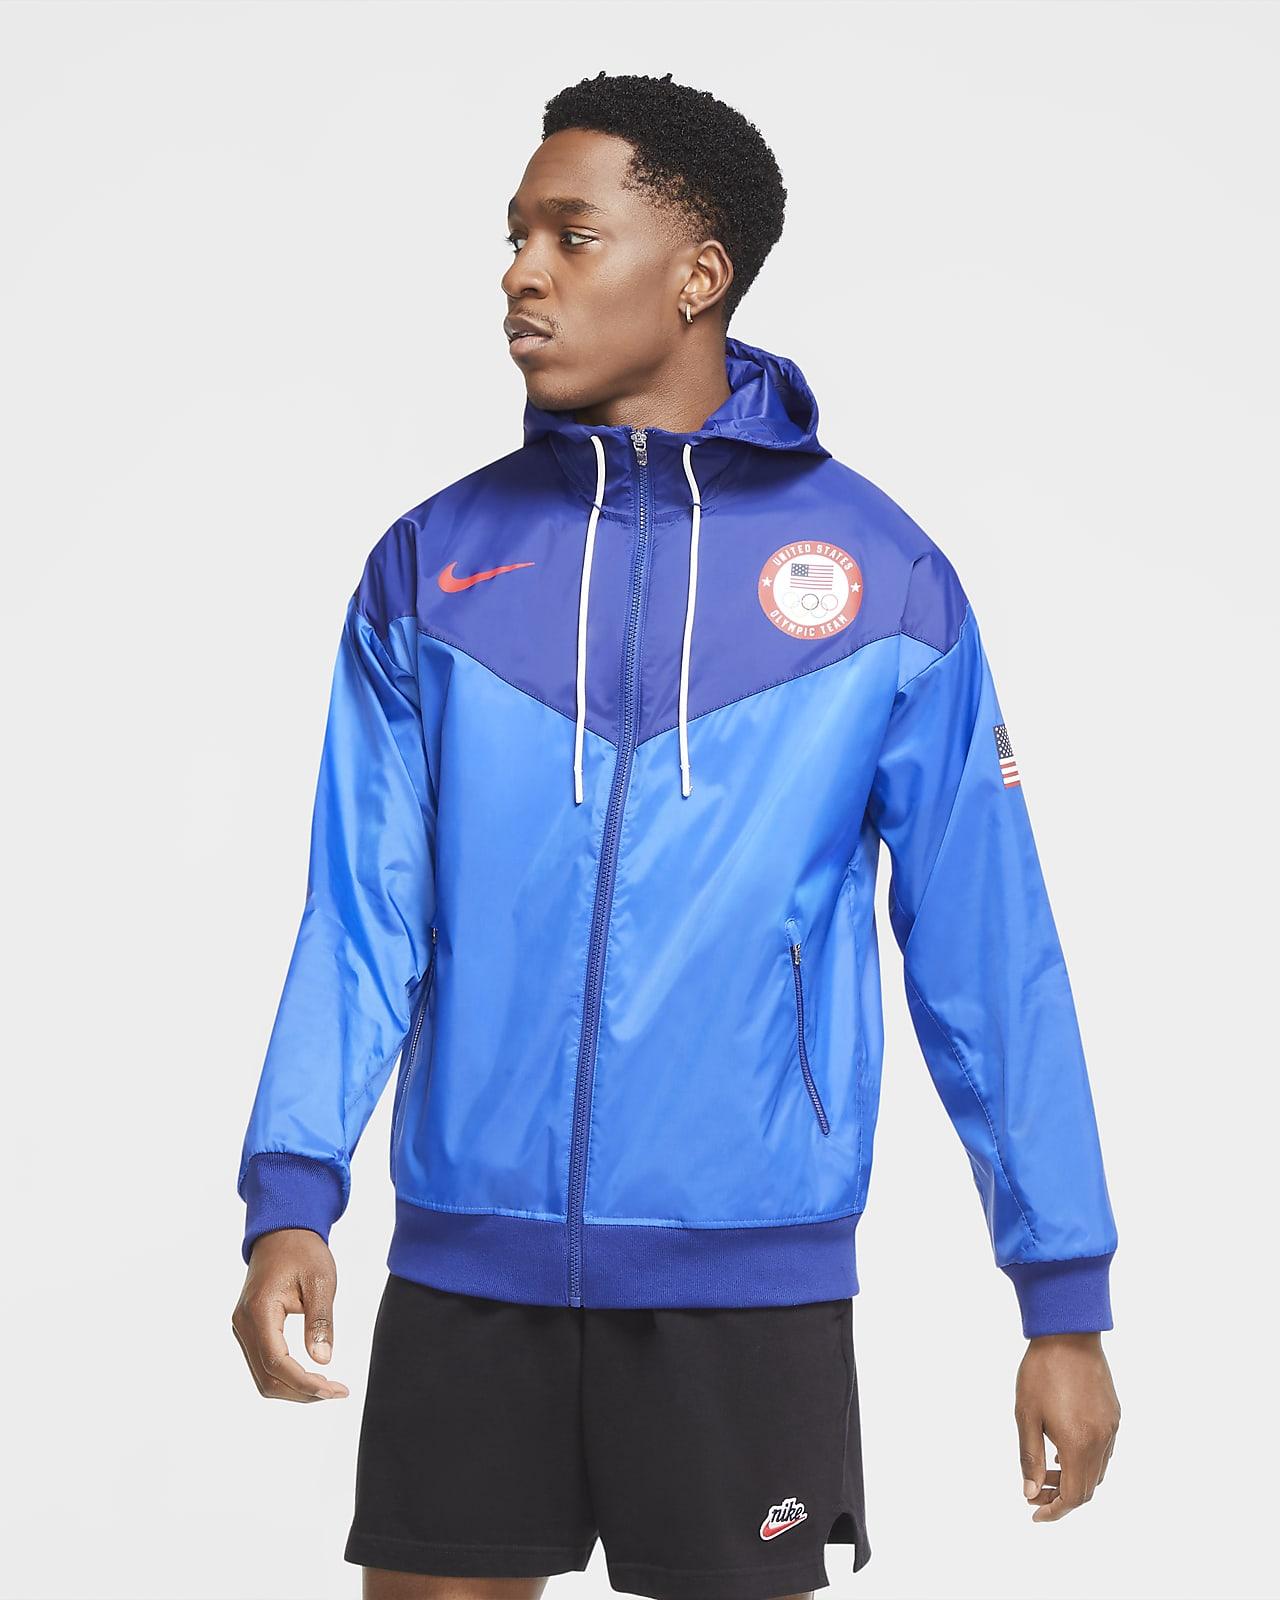 Nike Sportswear Team USA Windrunner Men's Woven Hooded Jacket